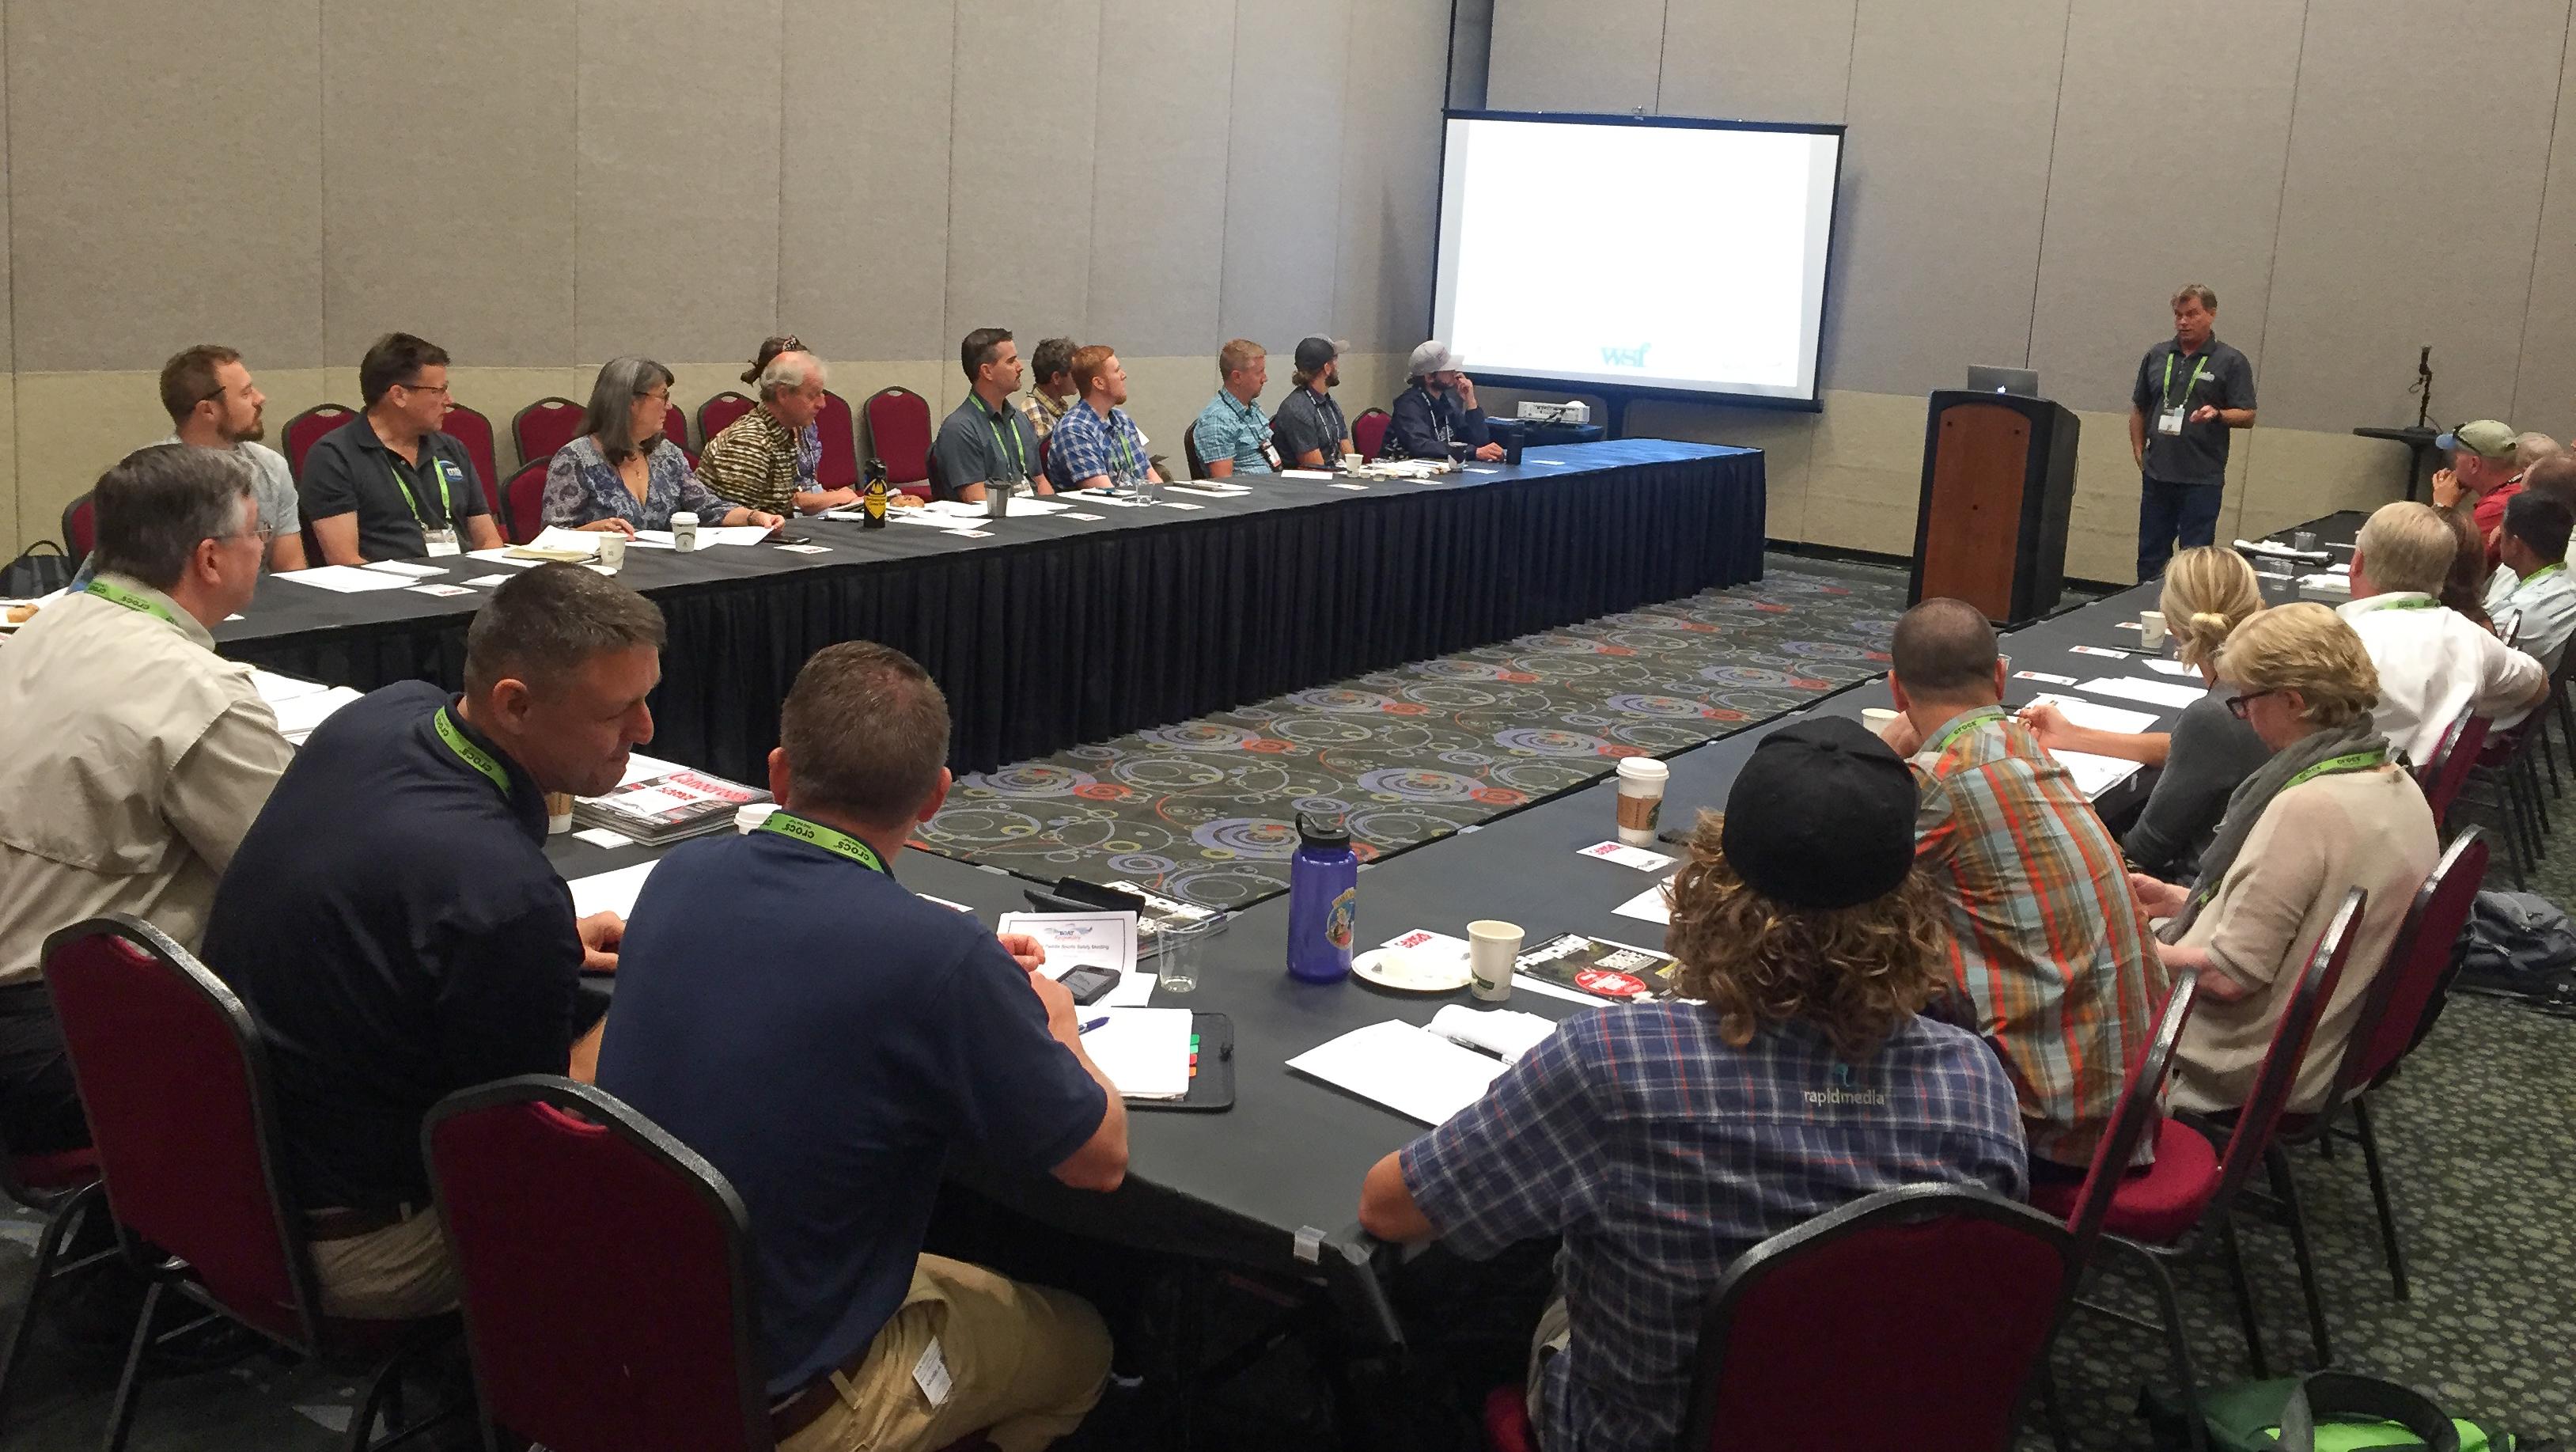 WSF__kayak_Aug 6 2016 Meeting.jpg